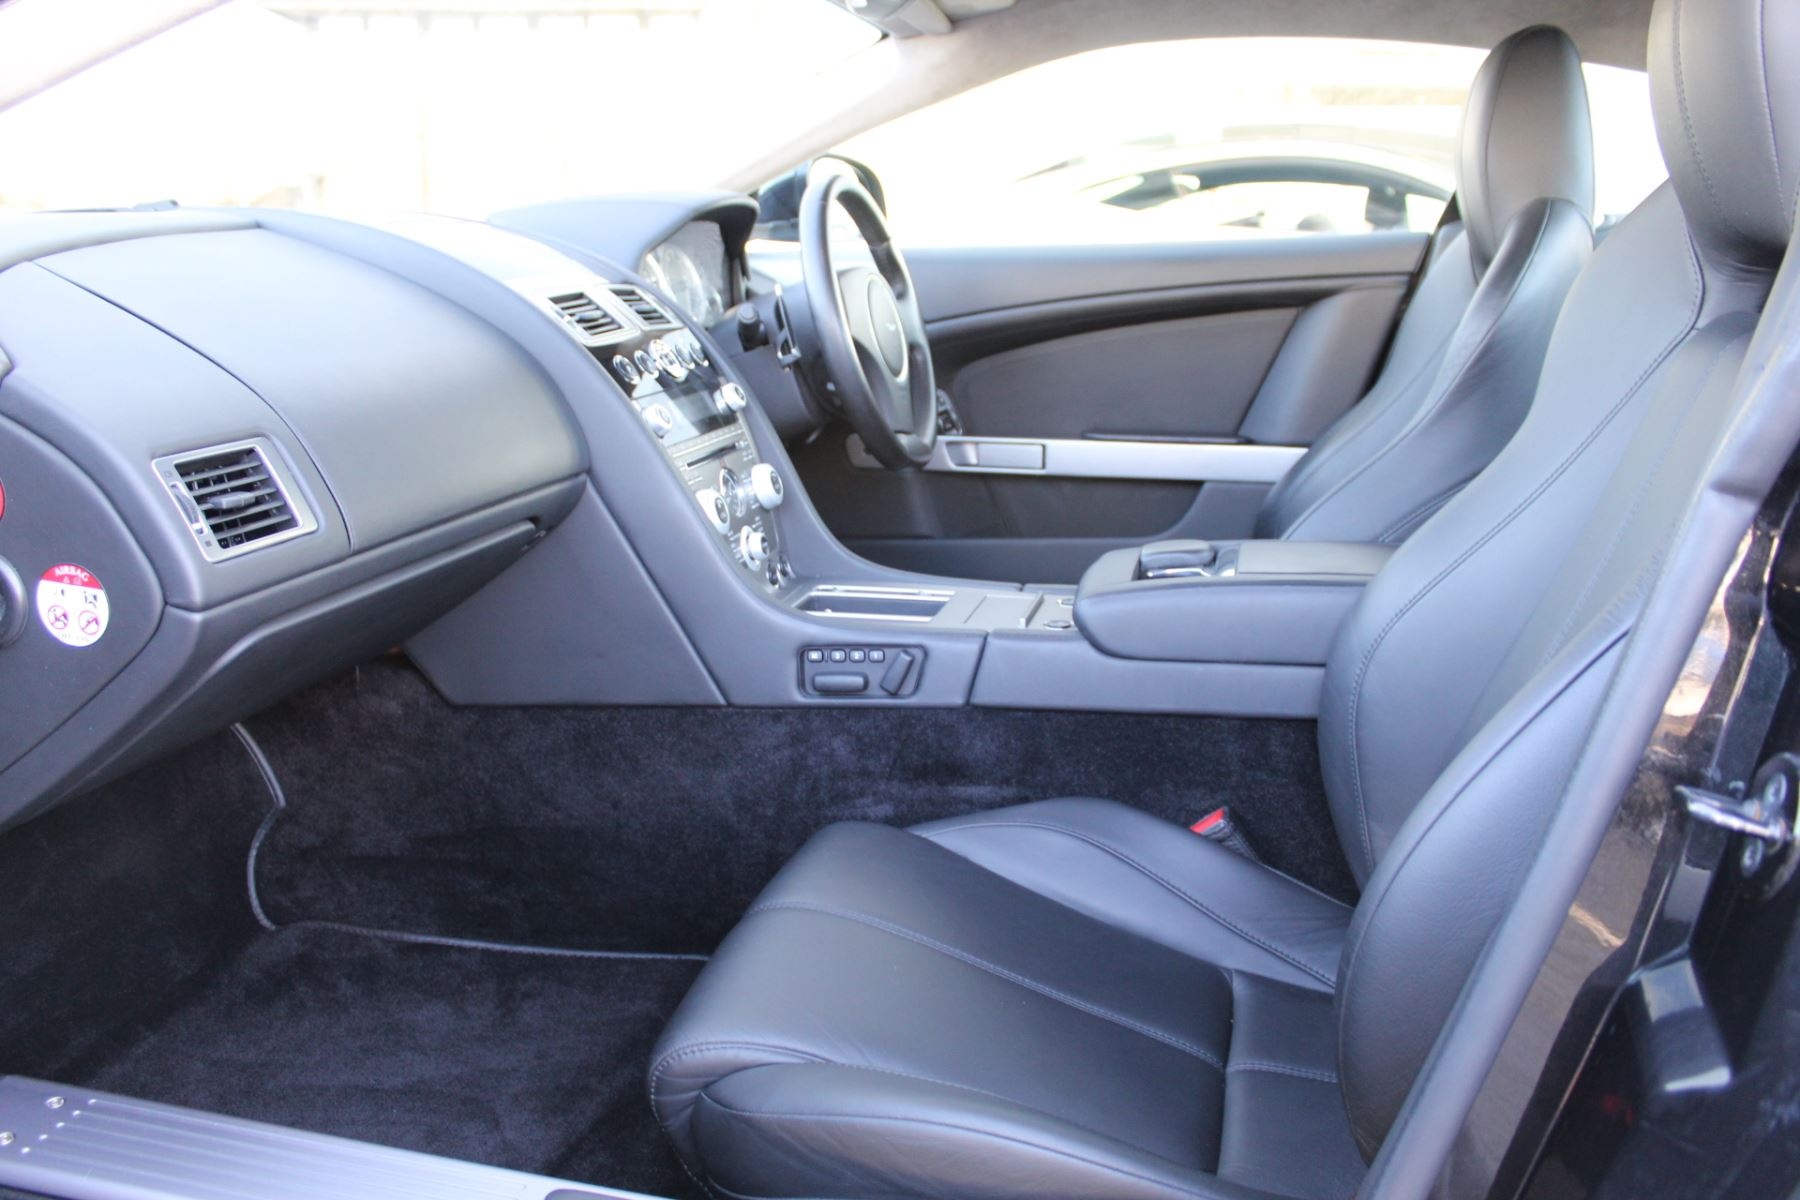 Aston Martin DB9 V12 2dr Touchtronic [470] image 10